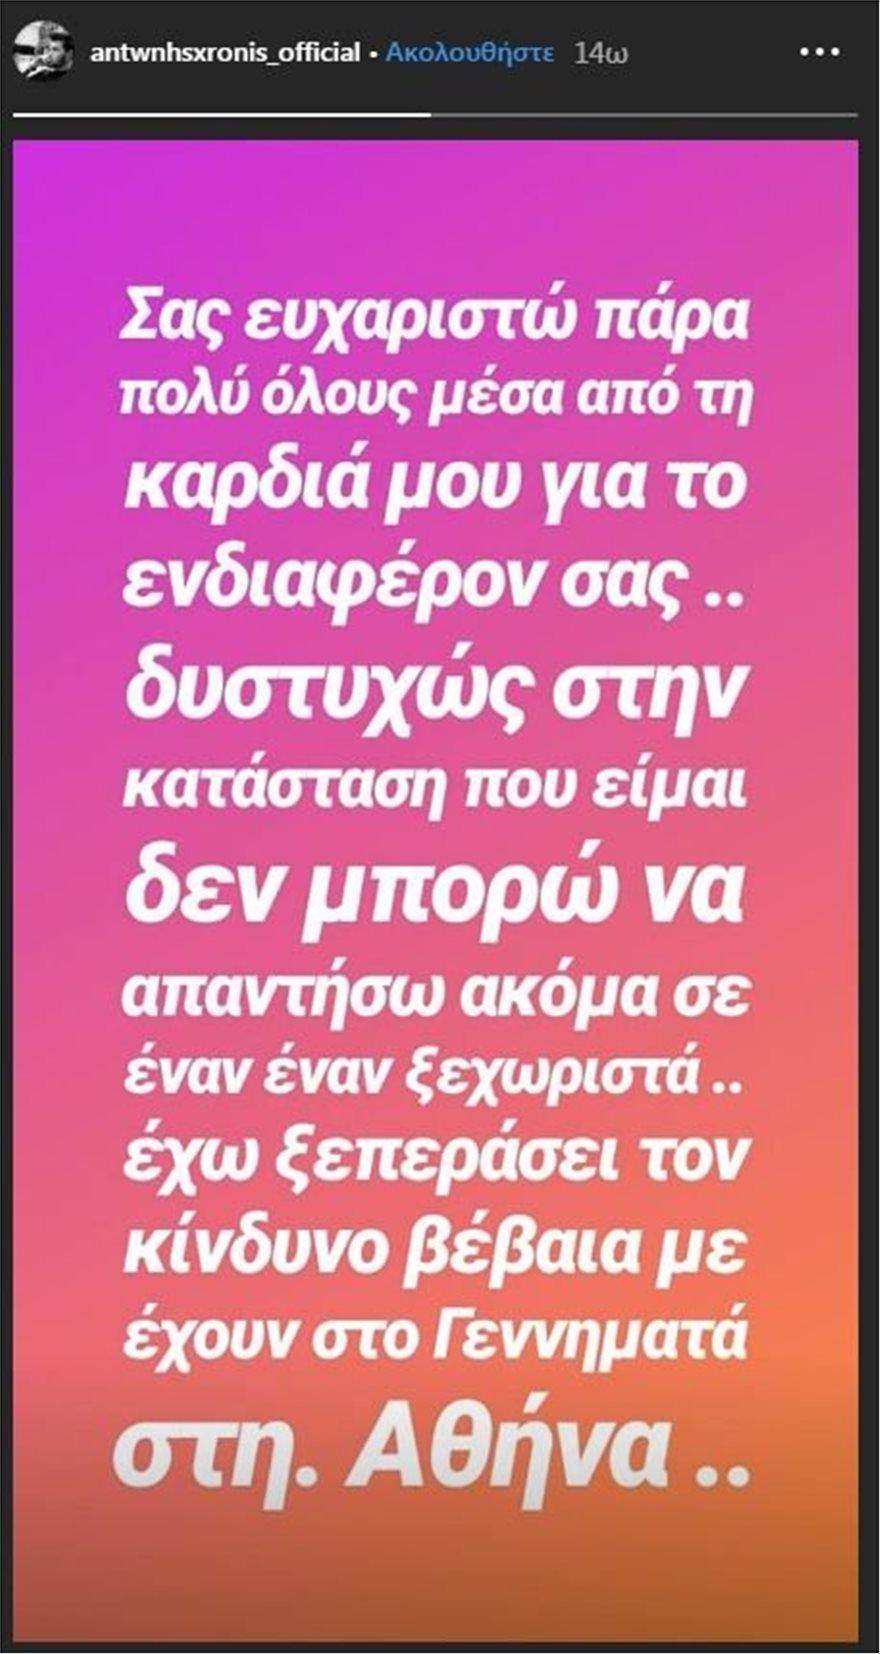 xronis_insta